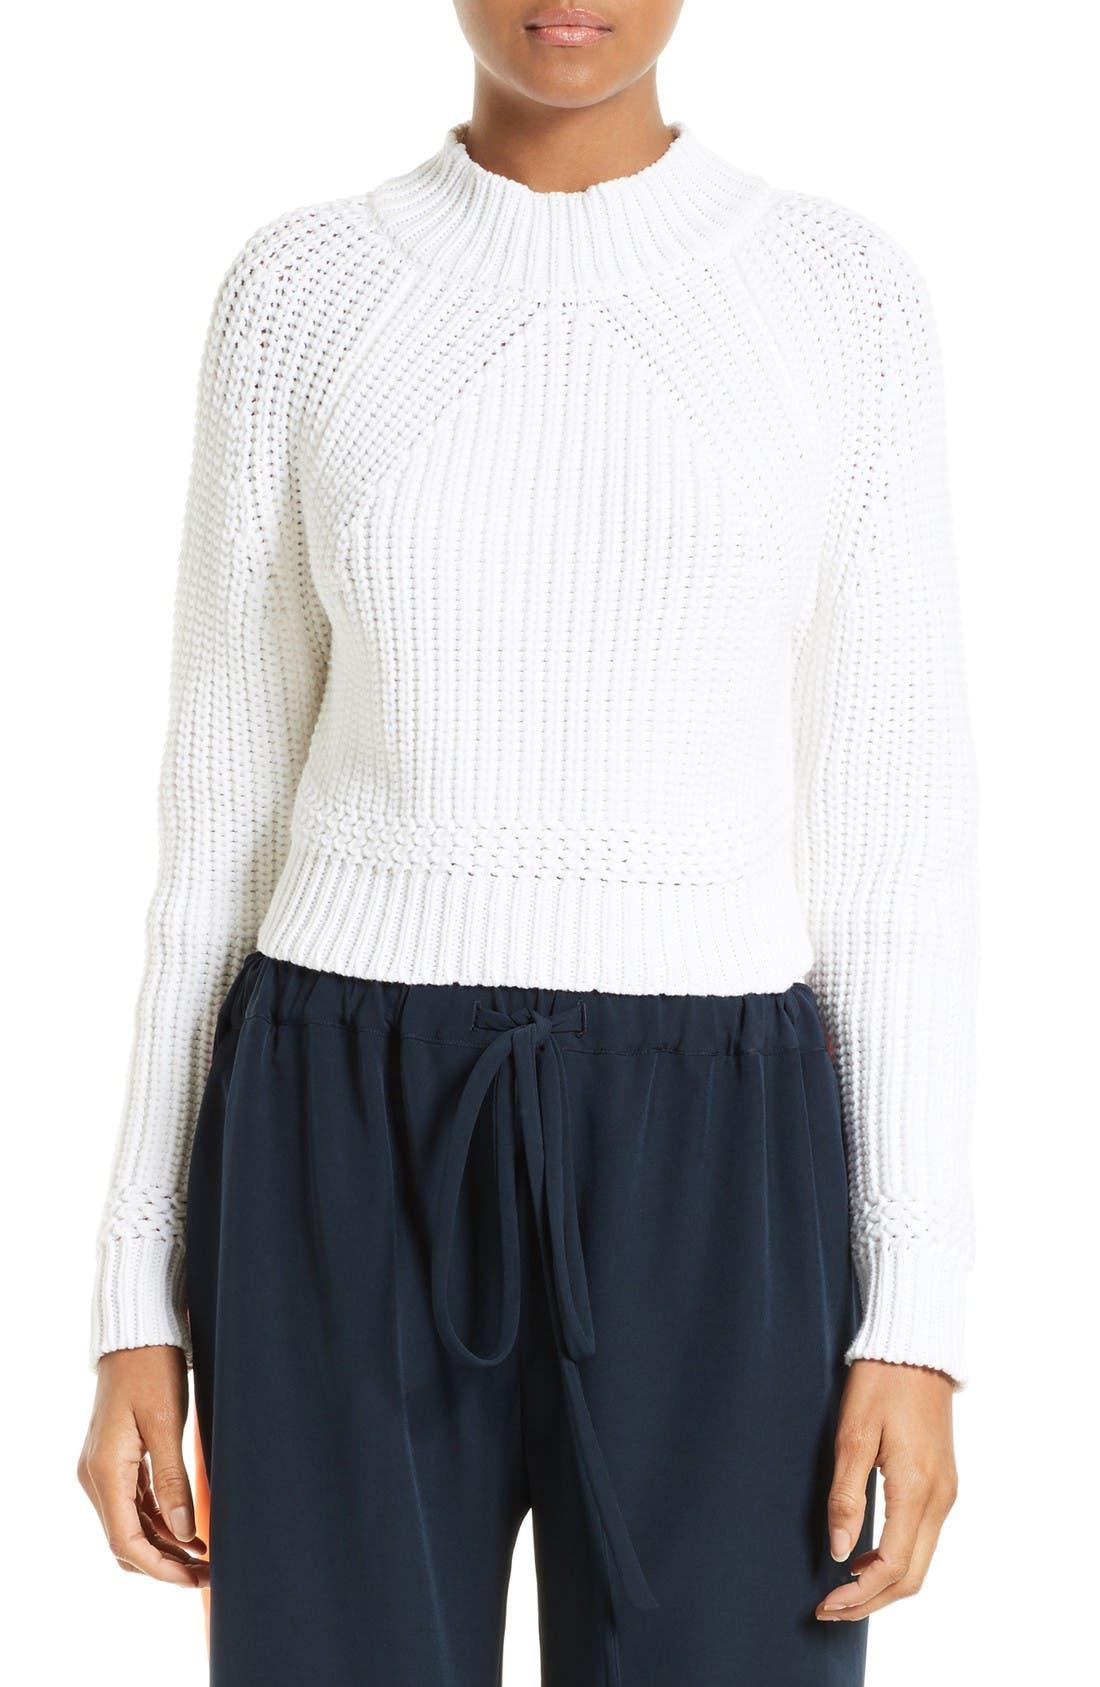 Milly Italian Fisherman Knit Sweater